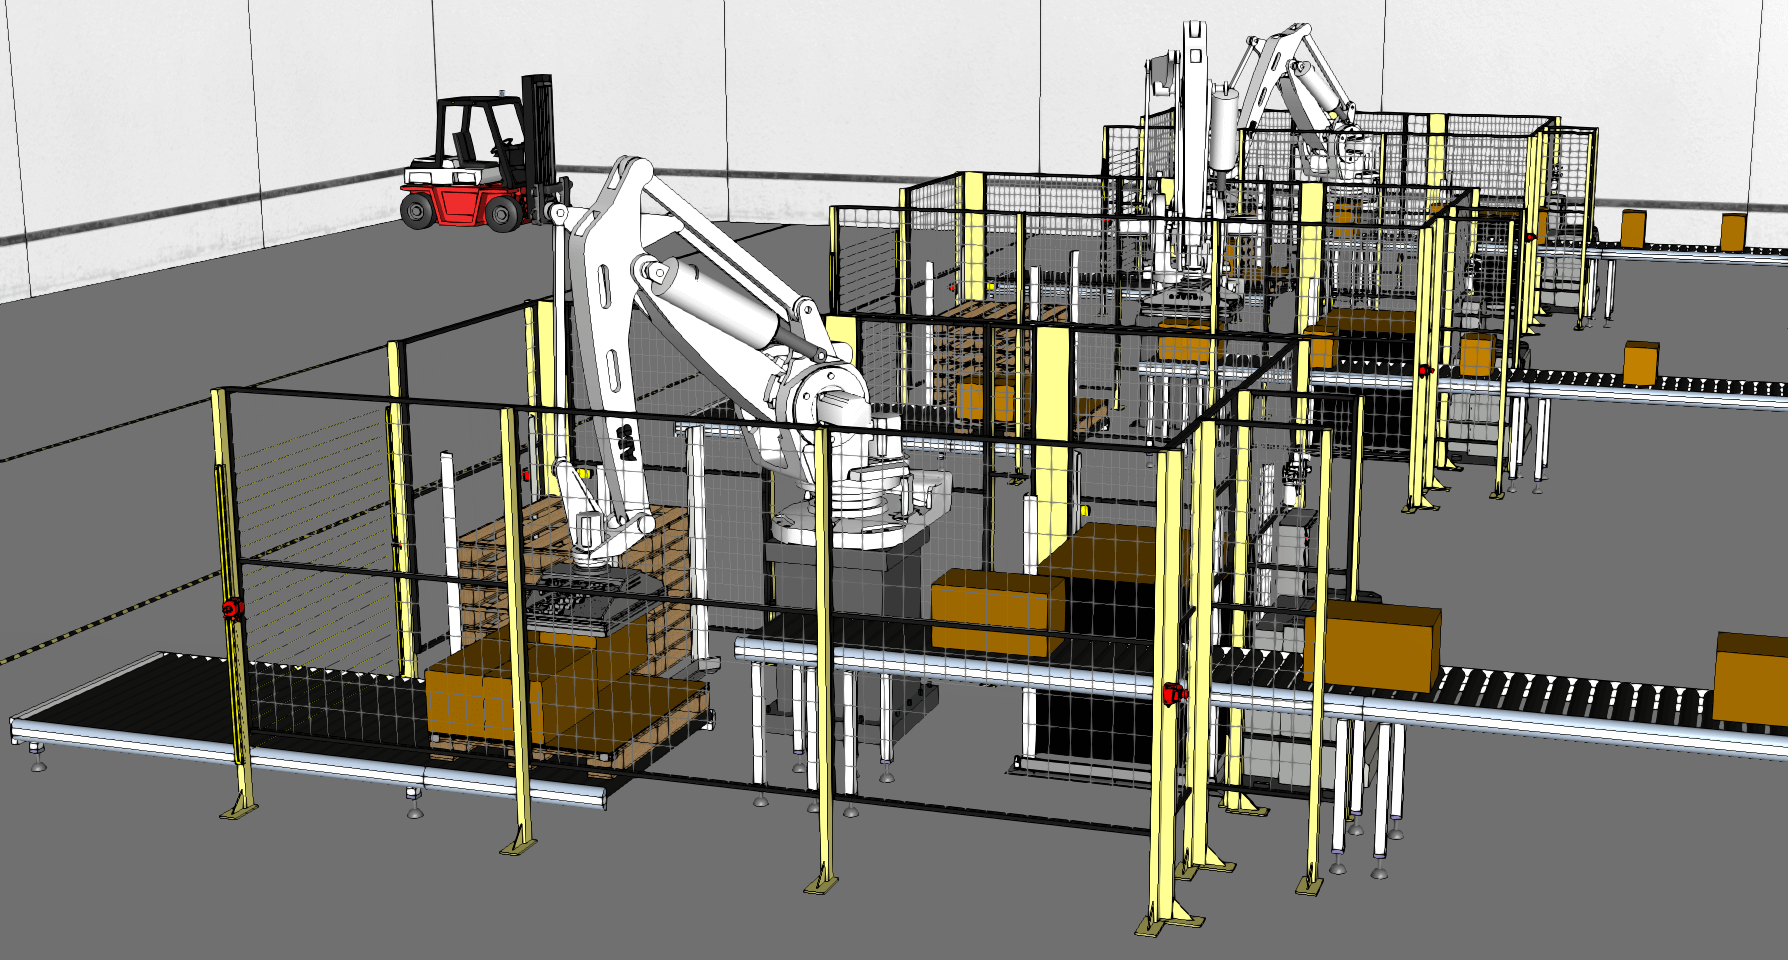 Rendering of robots at a conveyor belt